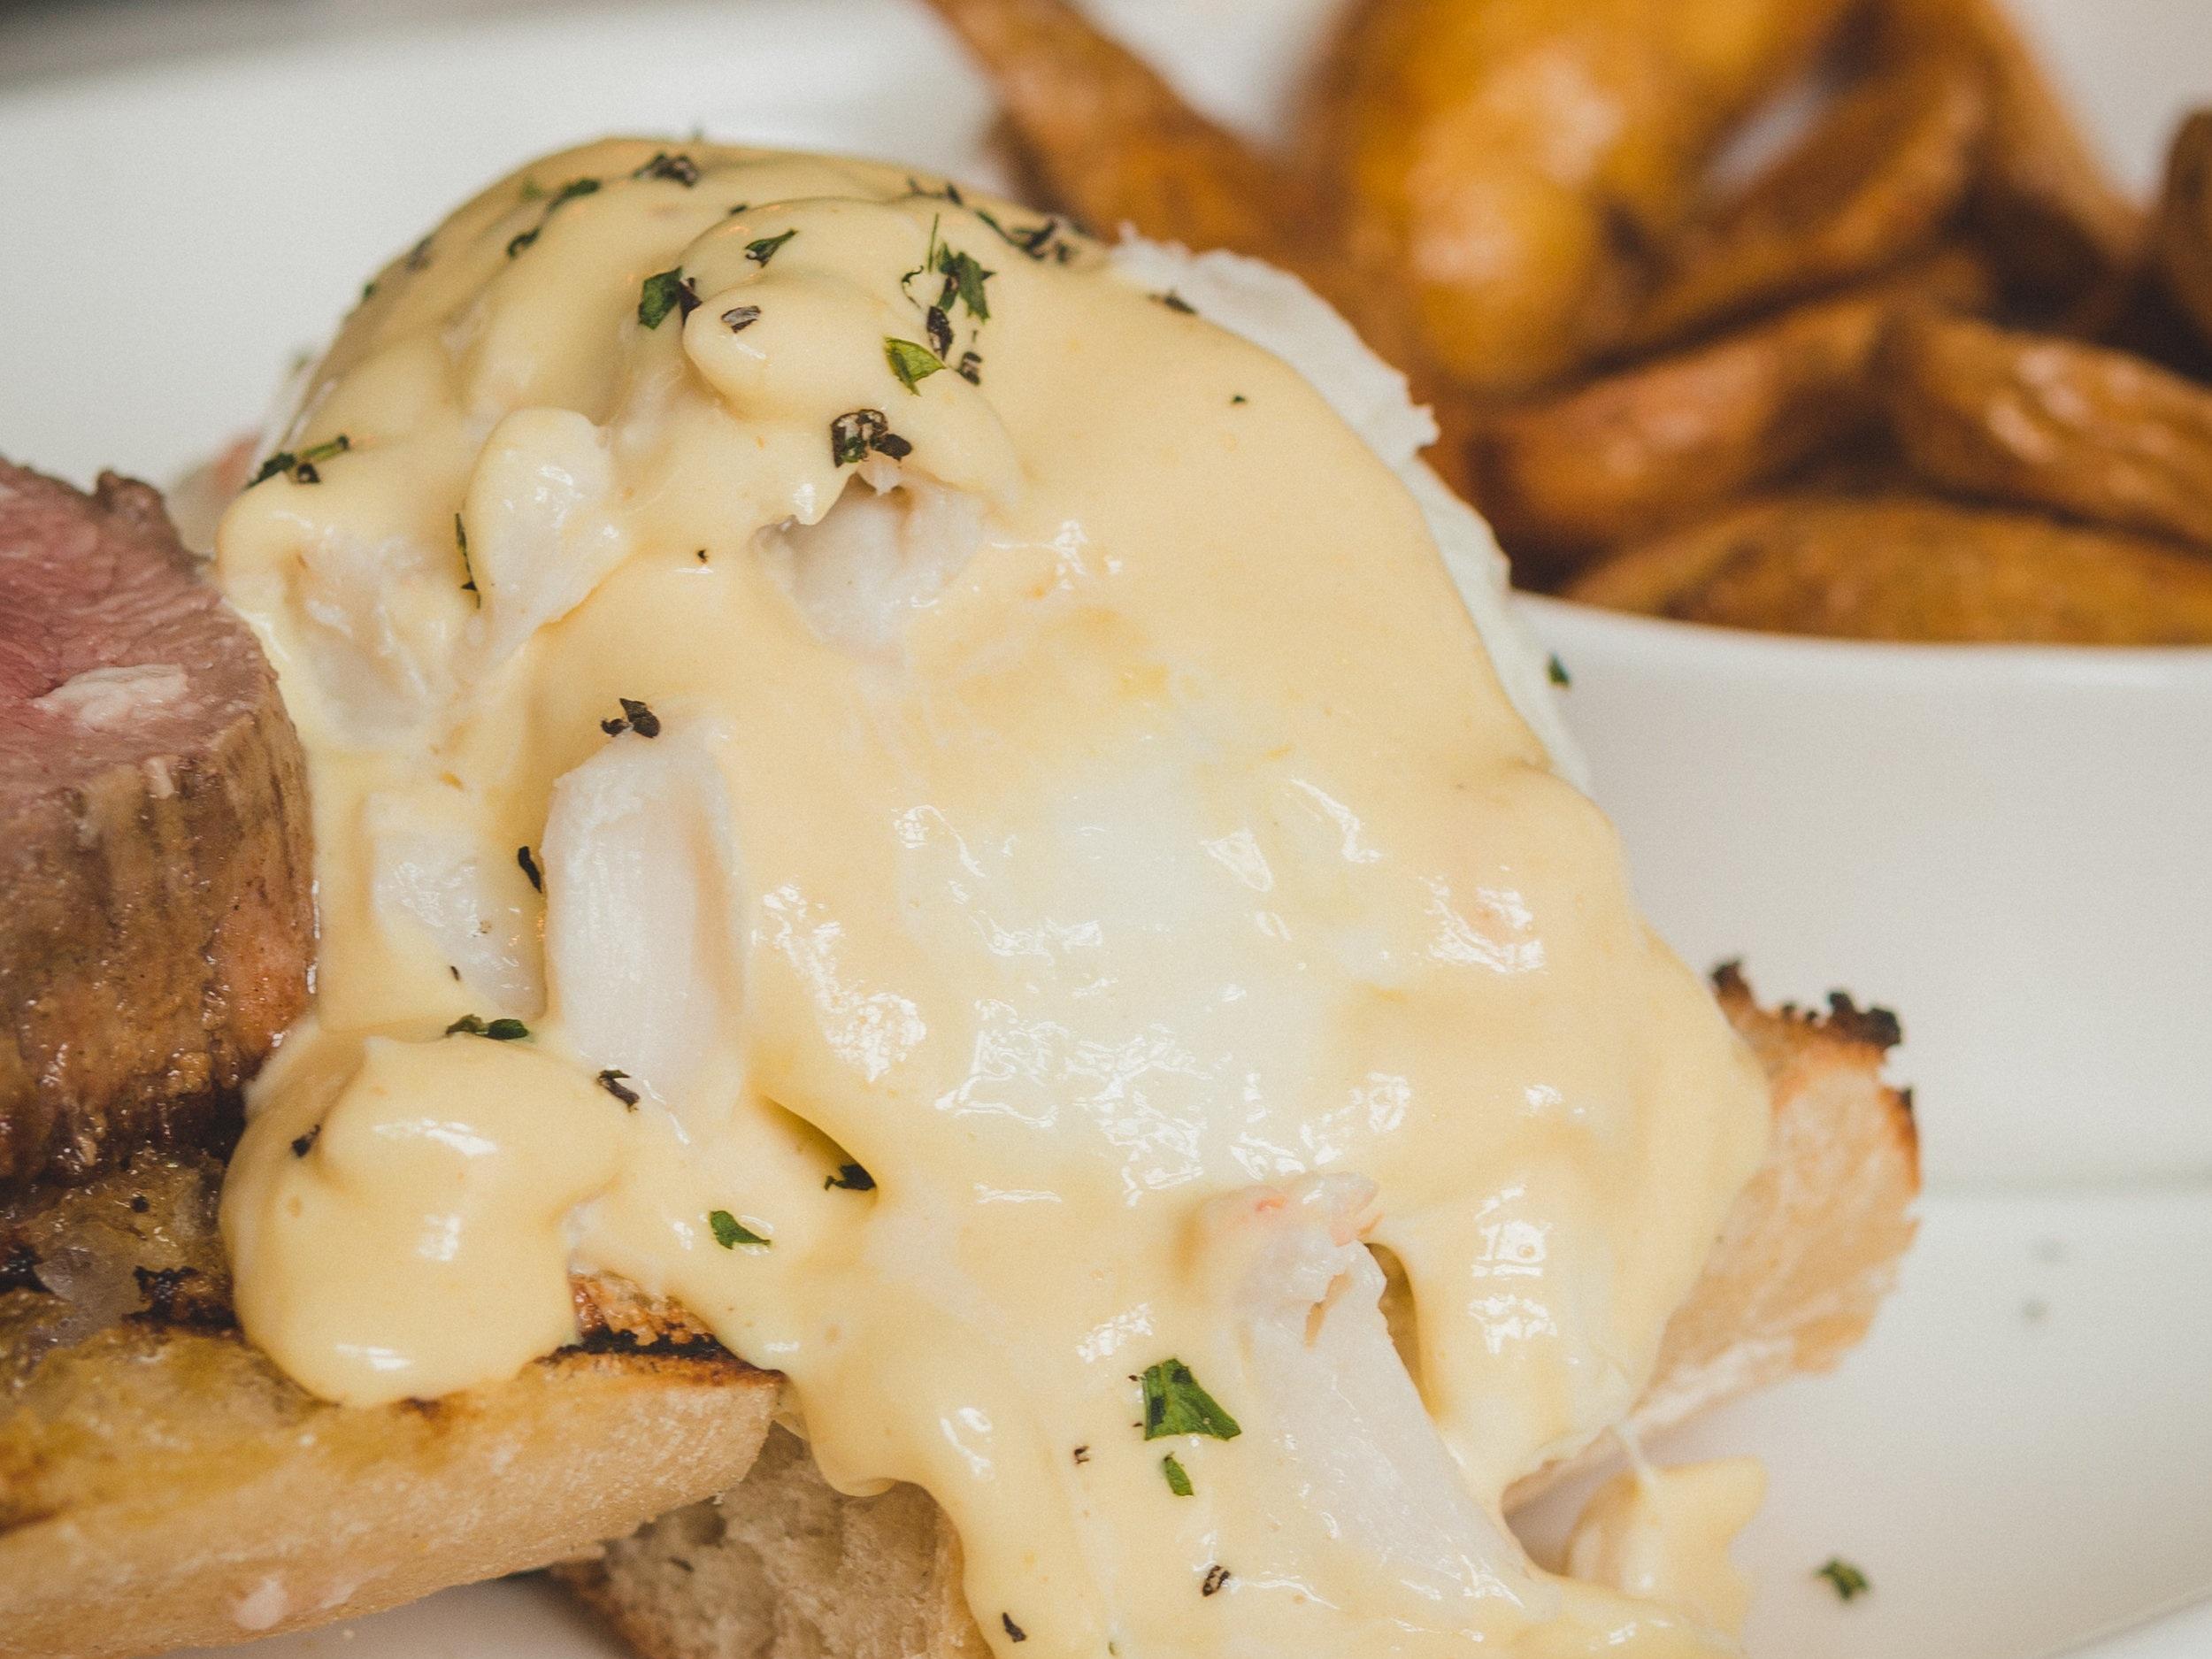 Surf & Turf Benedict: 5 oz. Filet, Jumbo Lump Crab, Sourdough English Muffin, Hollandaise